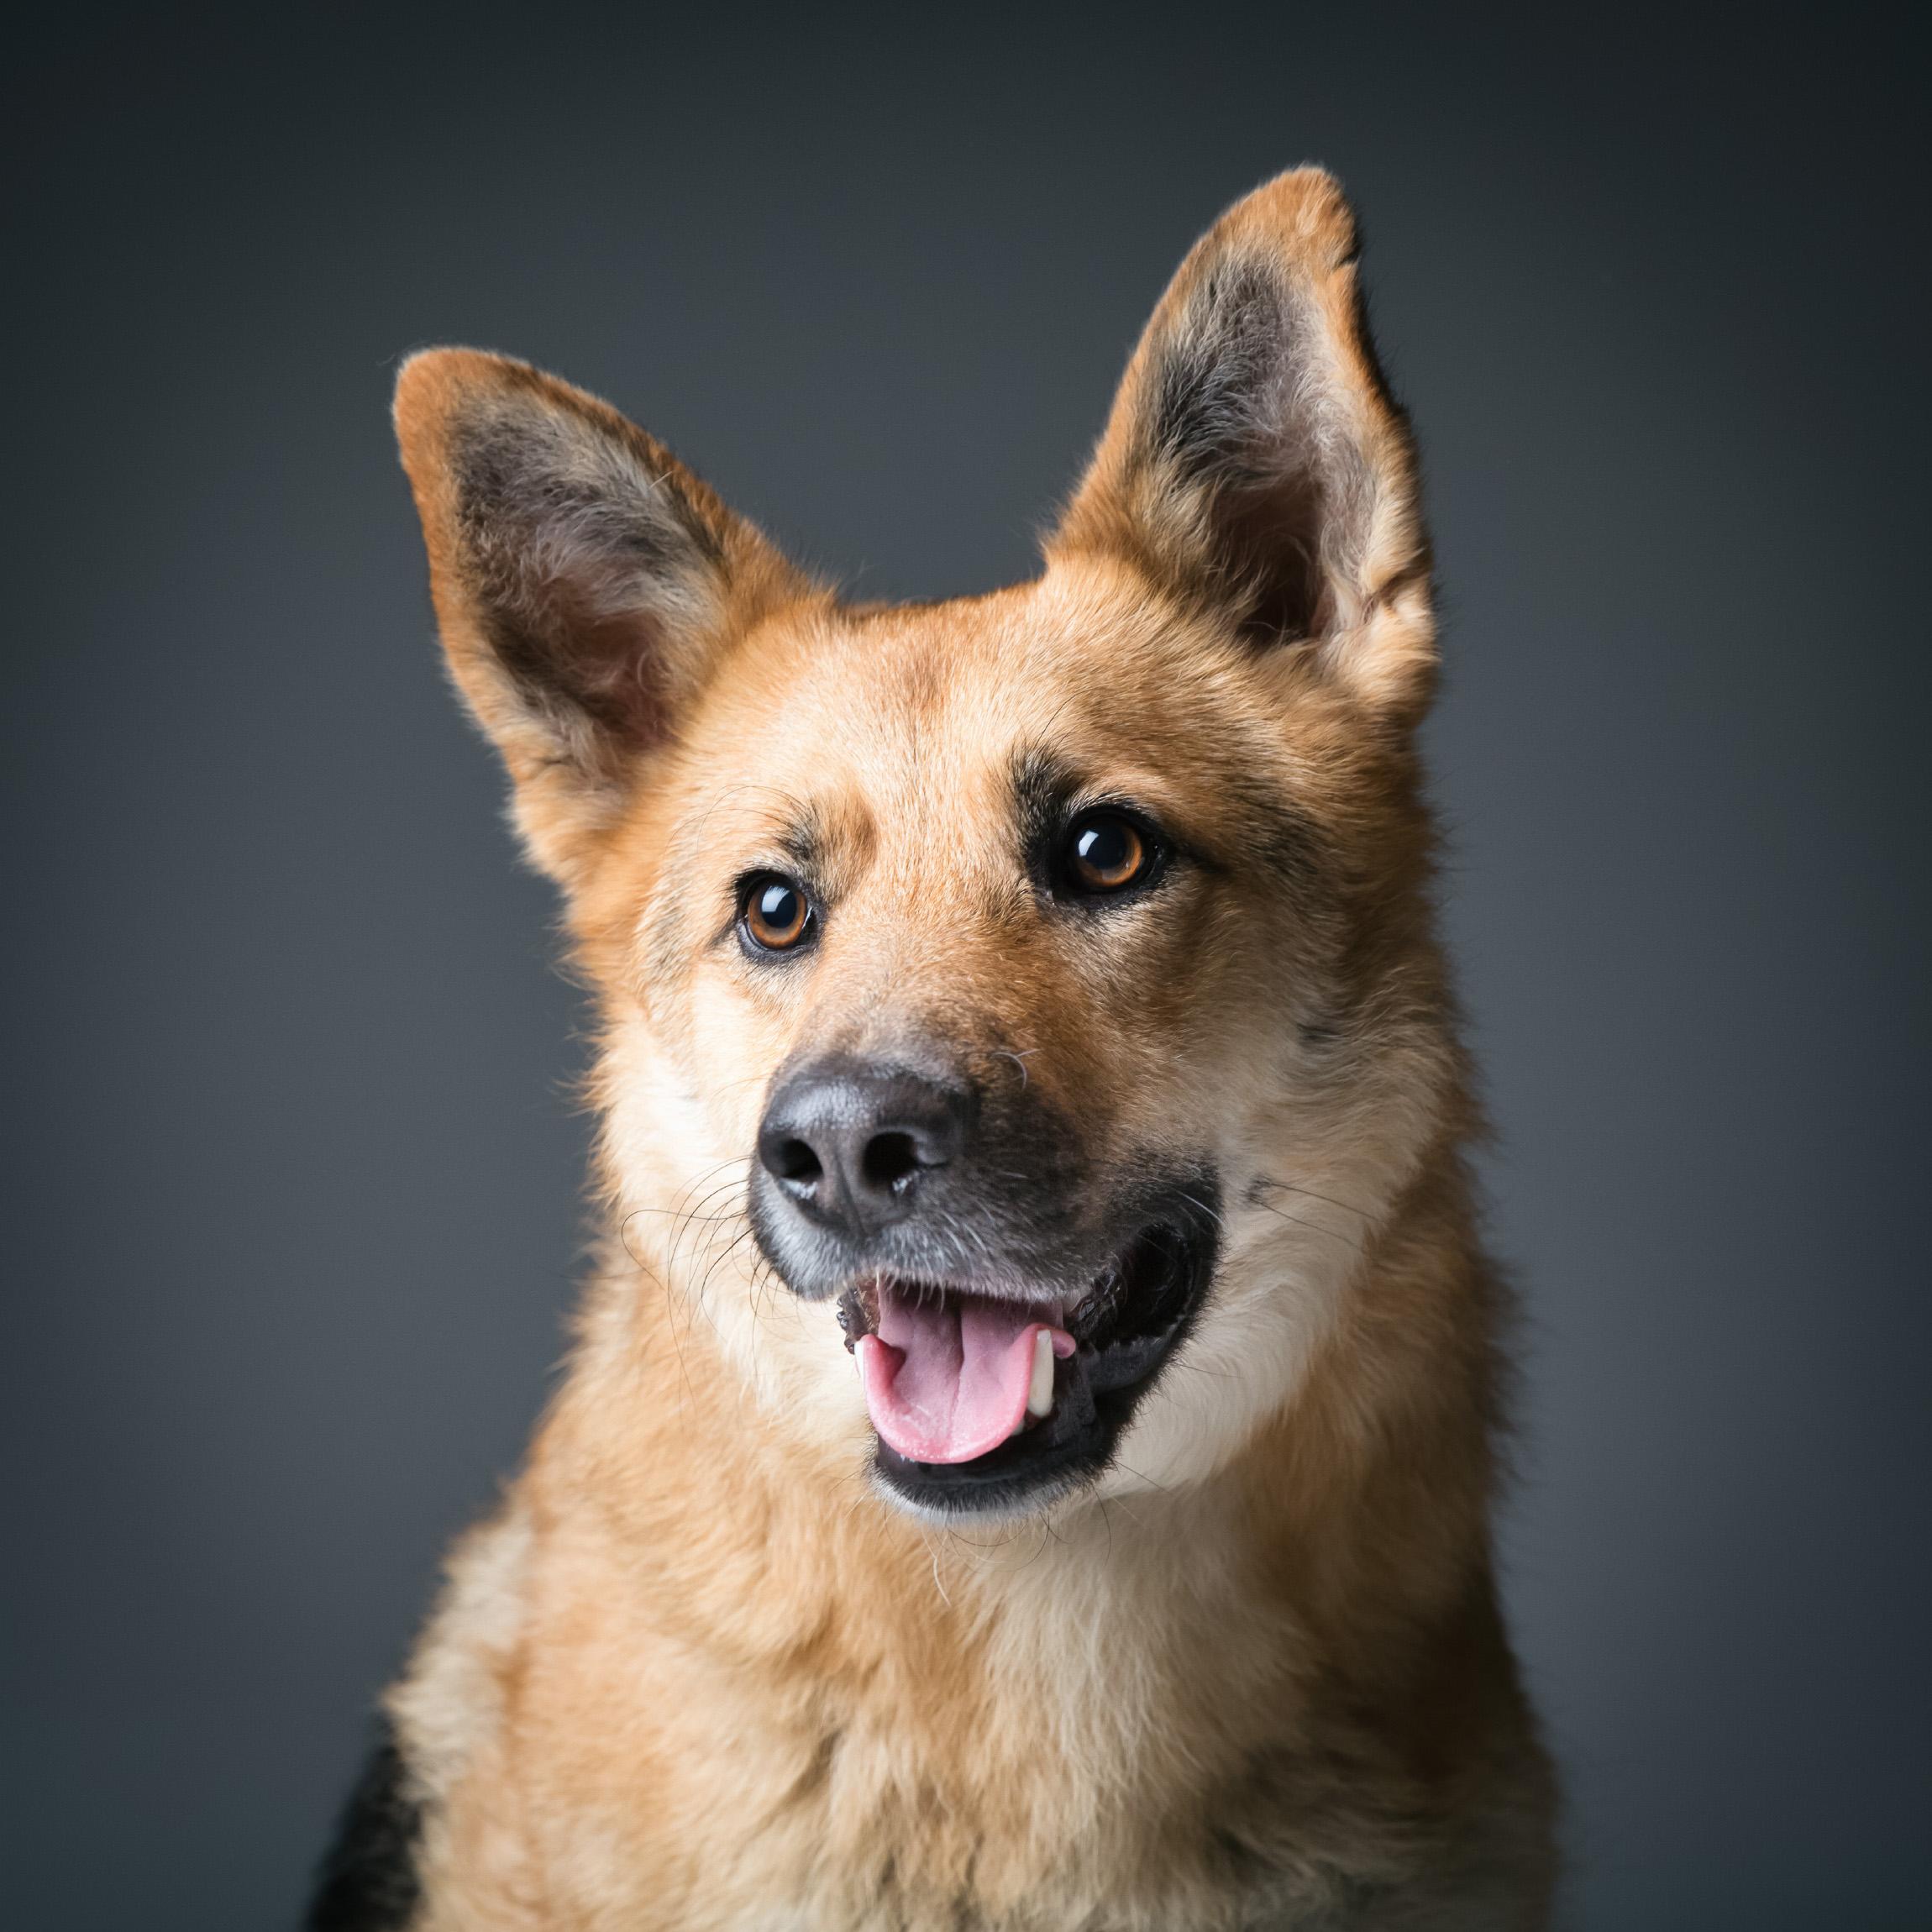 06 foto-gossos-celine-pech-andorra-0142